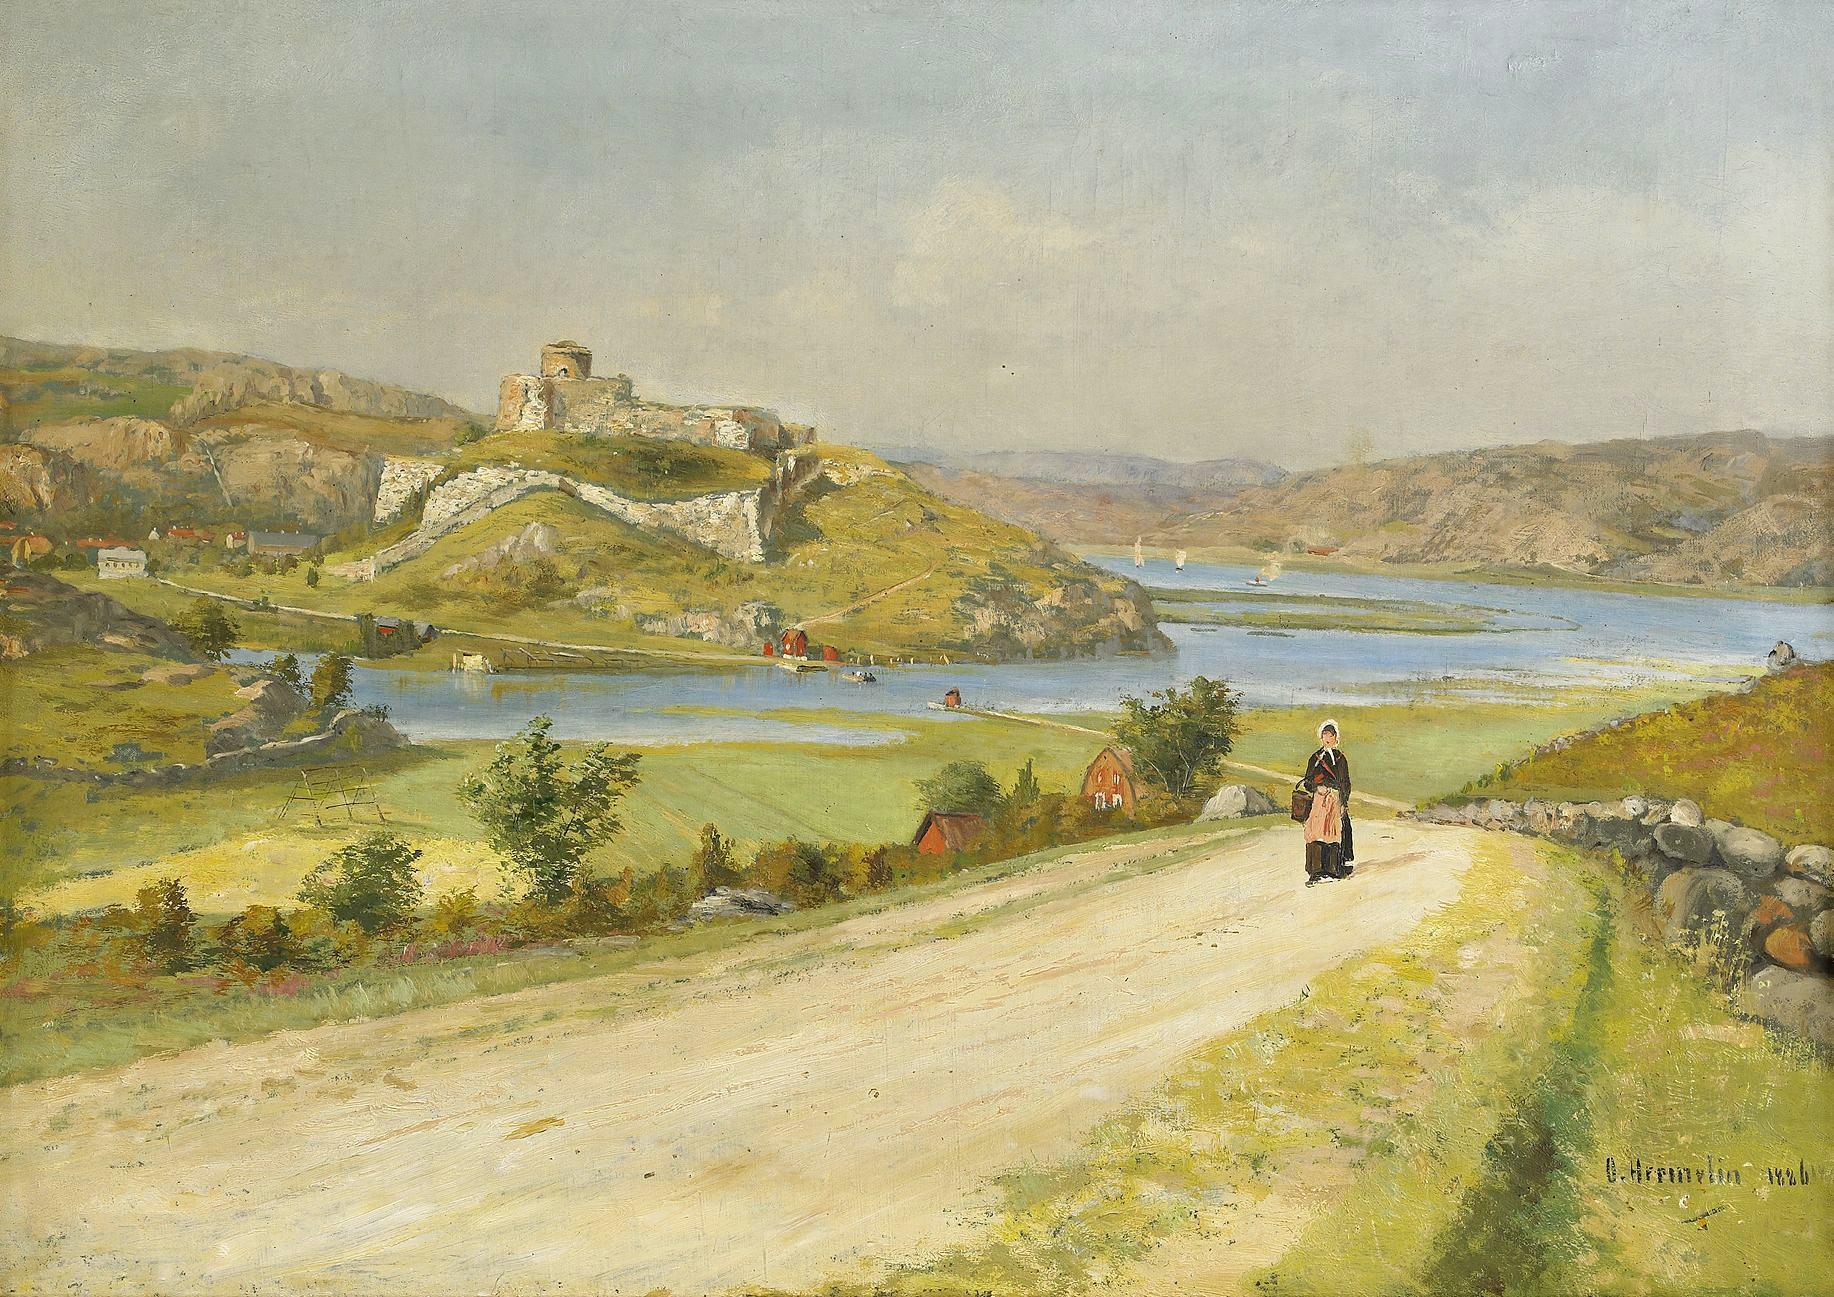 UTSIKT MOT BOHUS FÄSTNING 1896 av OLOF HERMELIN